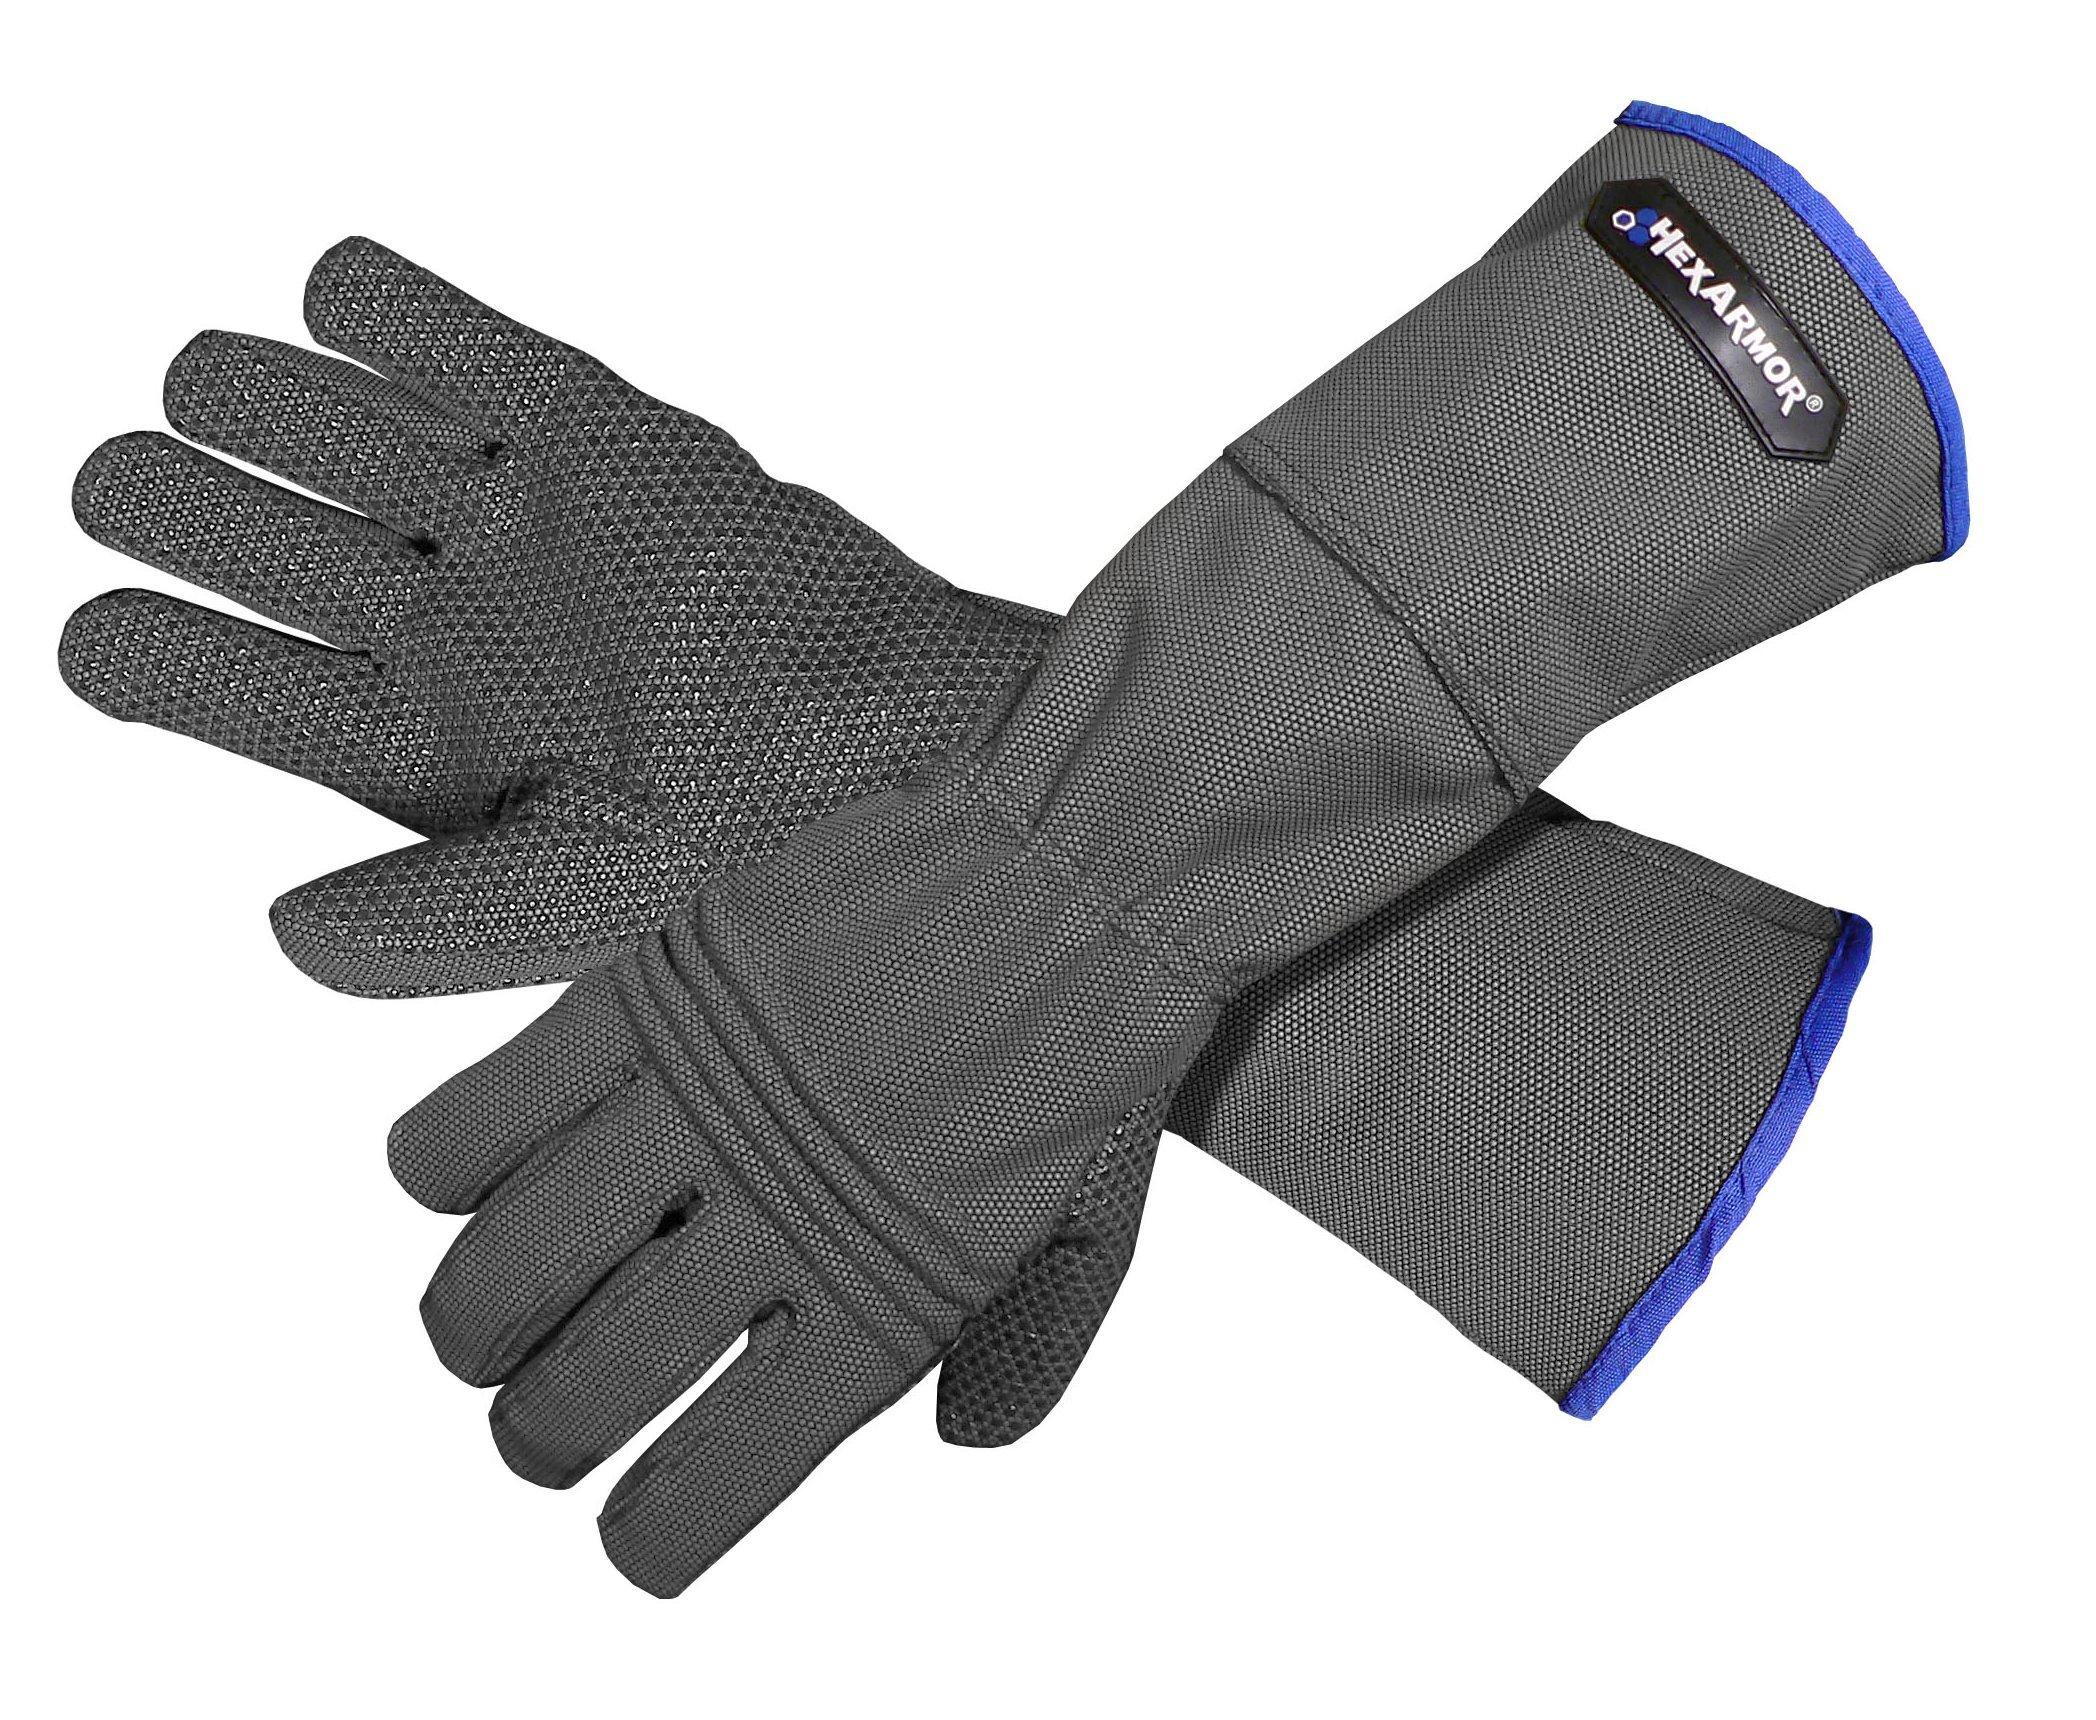 HexArmor 400R6E Hercules Heavy Duty Cut Puncture Needle Stick Resistant Work Safety Gloves Medium